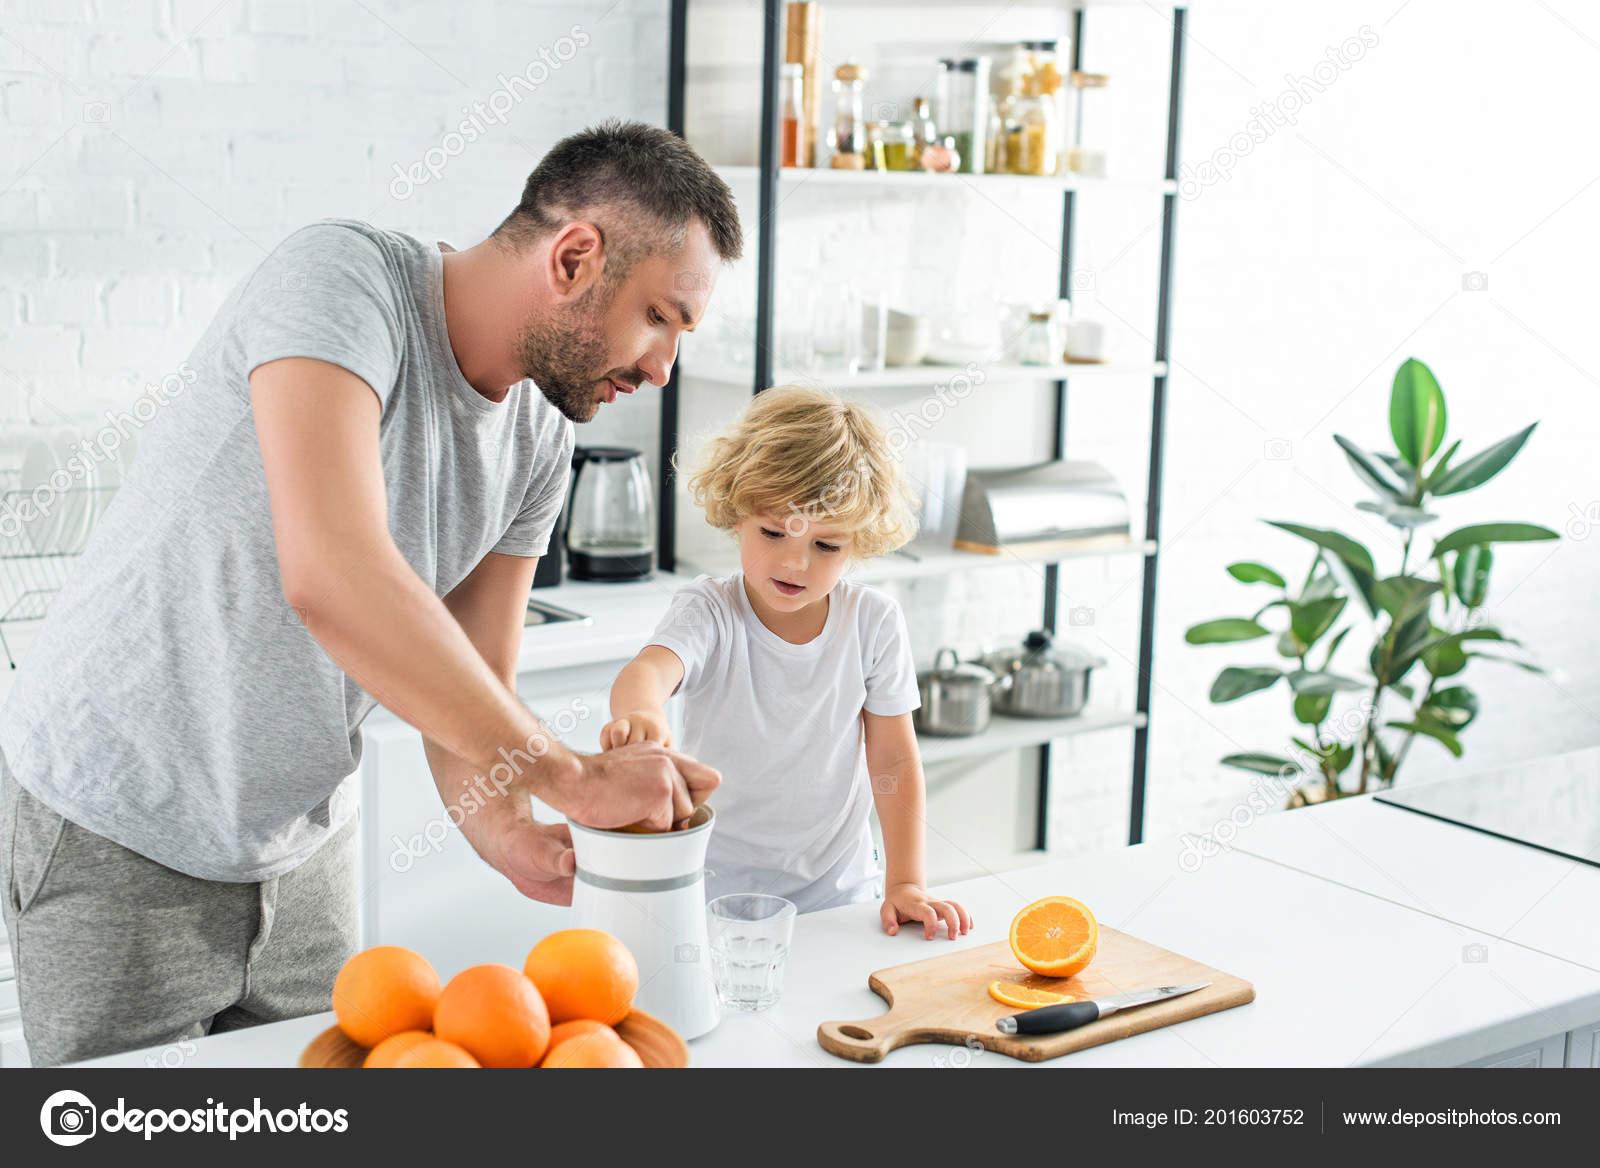 Daddy vs juicee